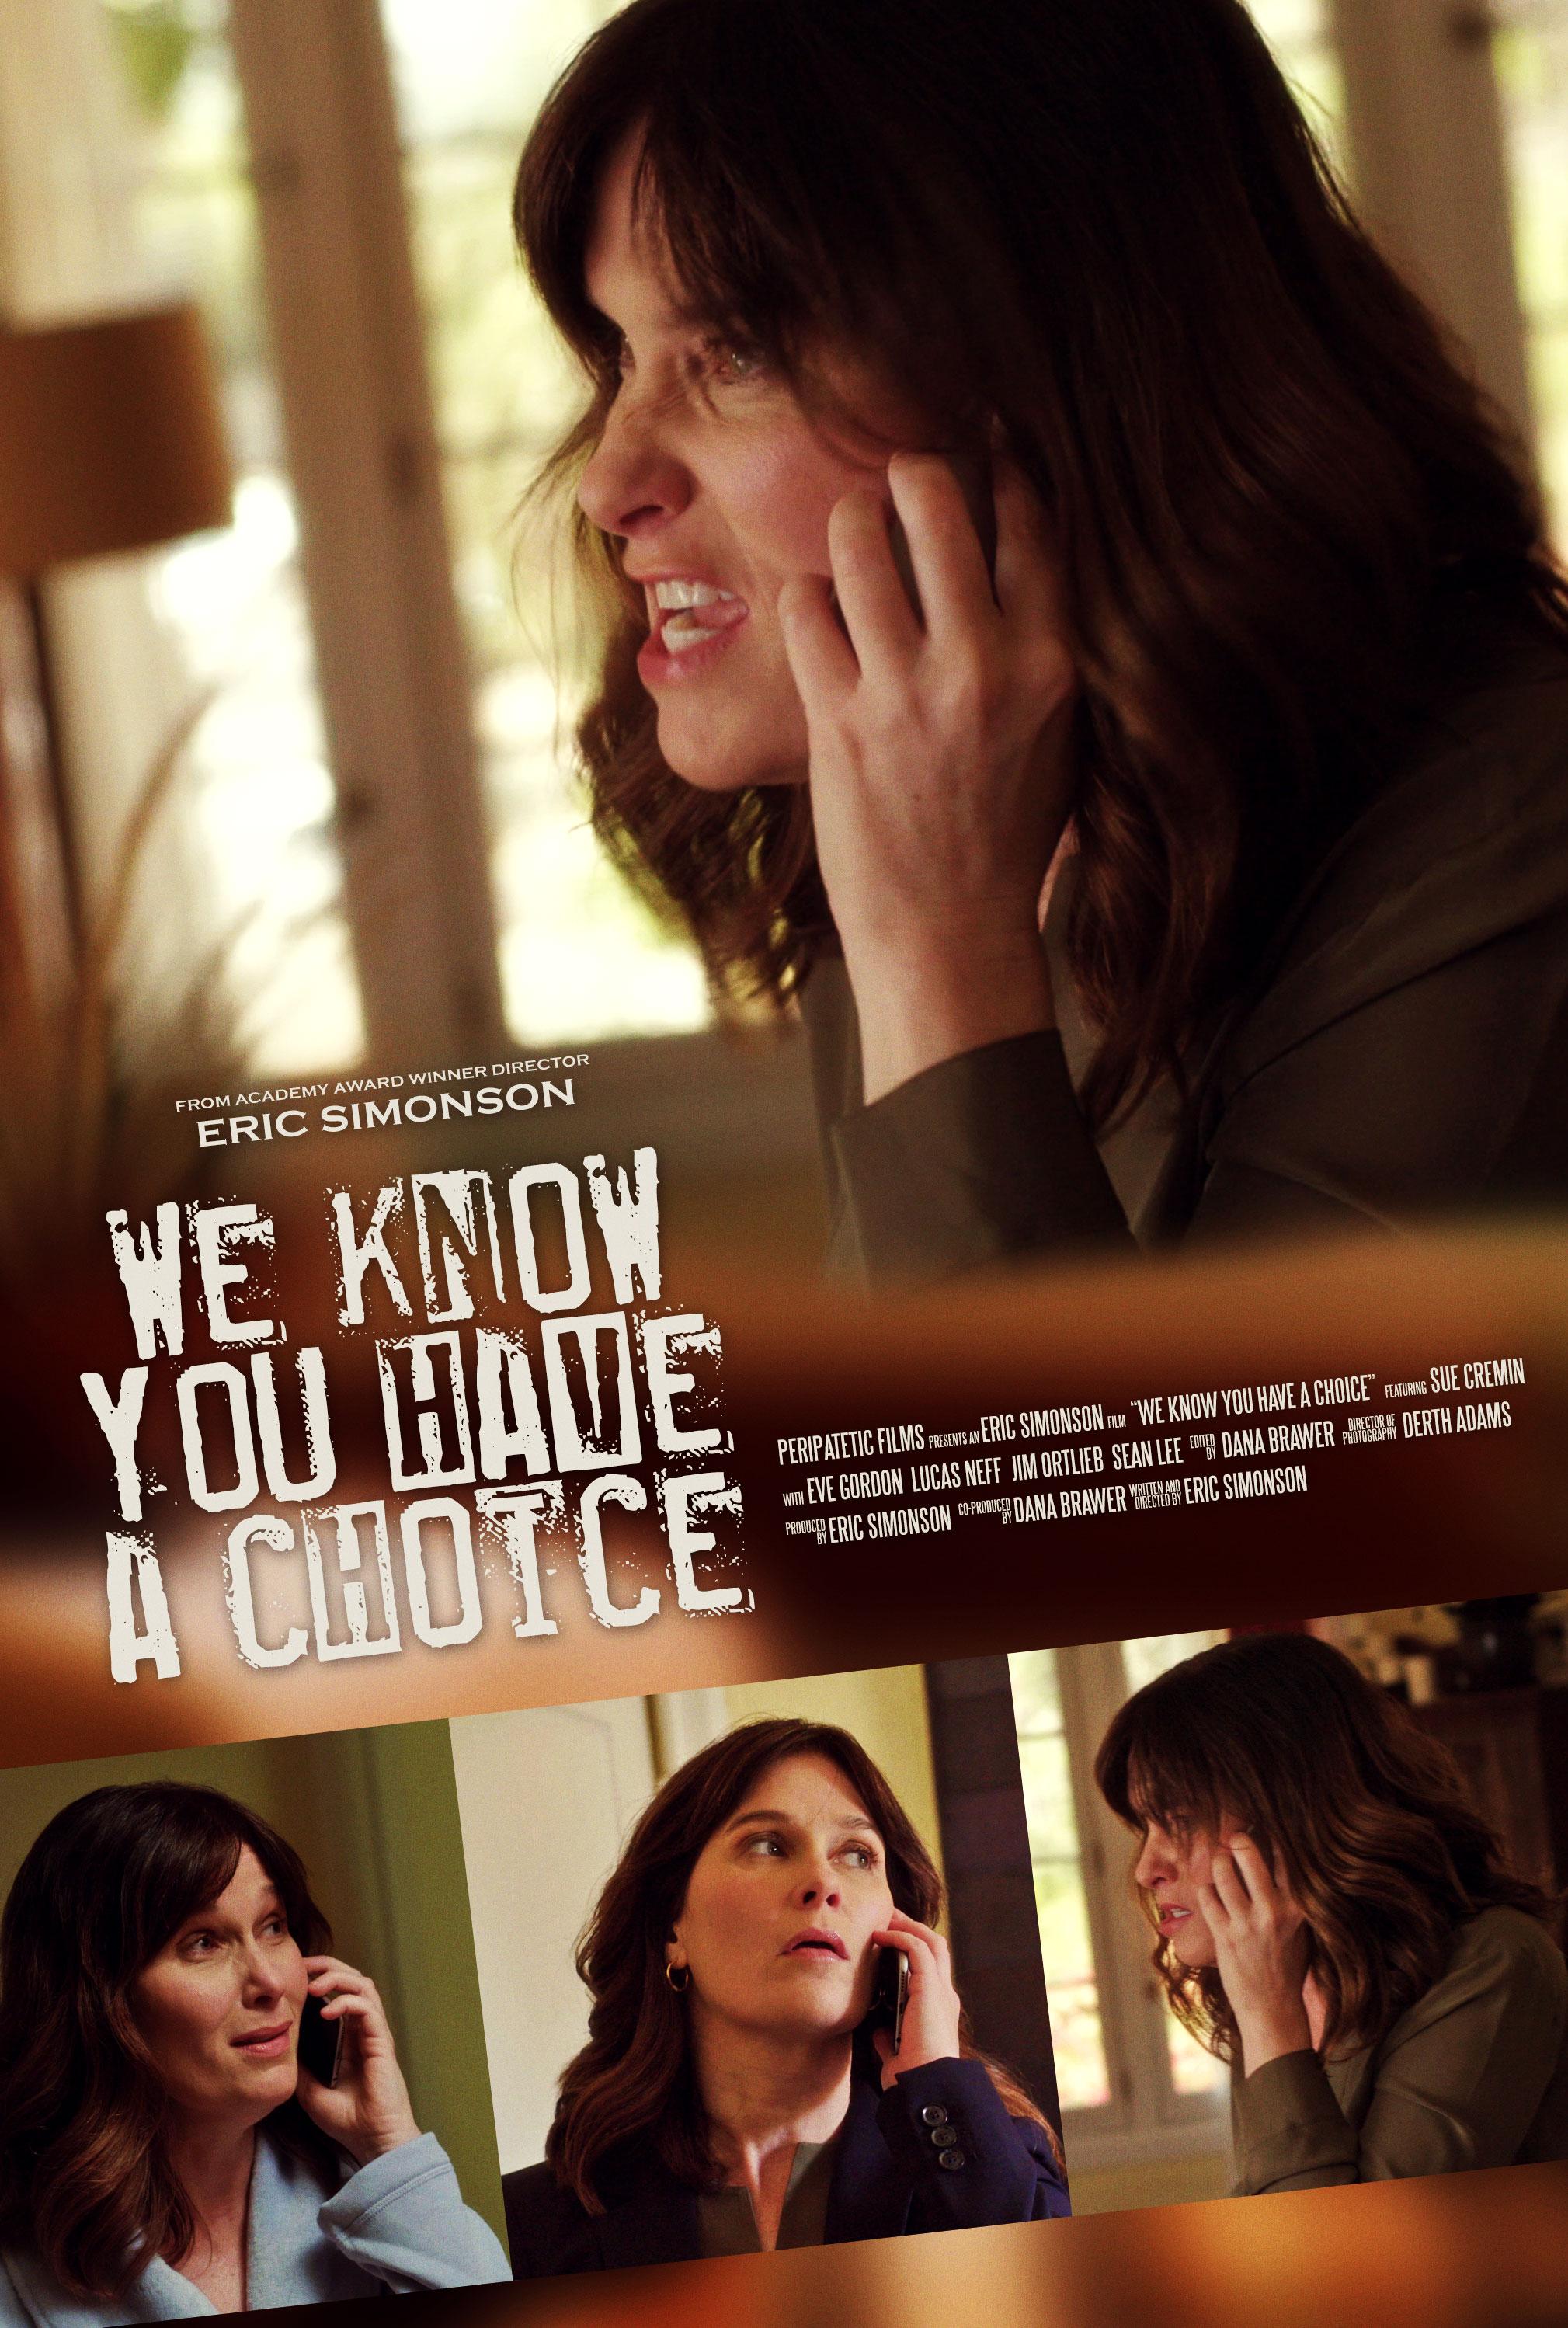 eric-simonson-director-we-know-choice